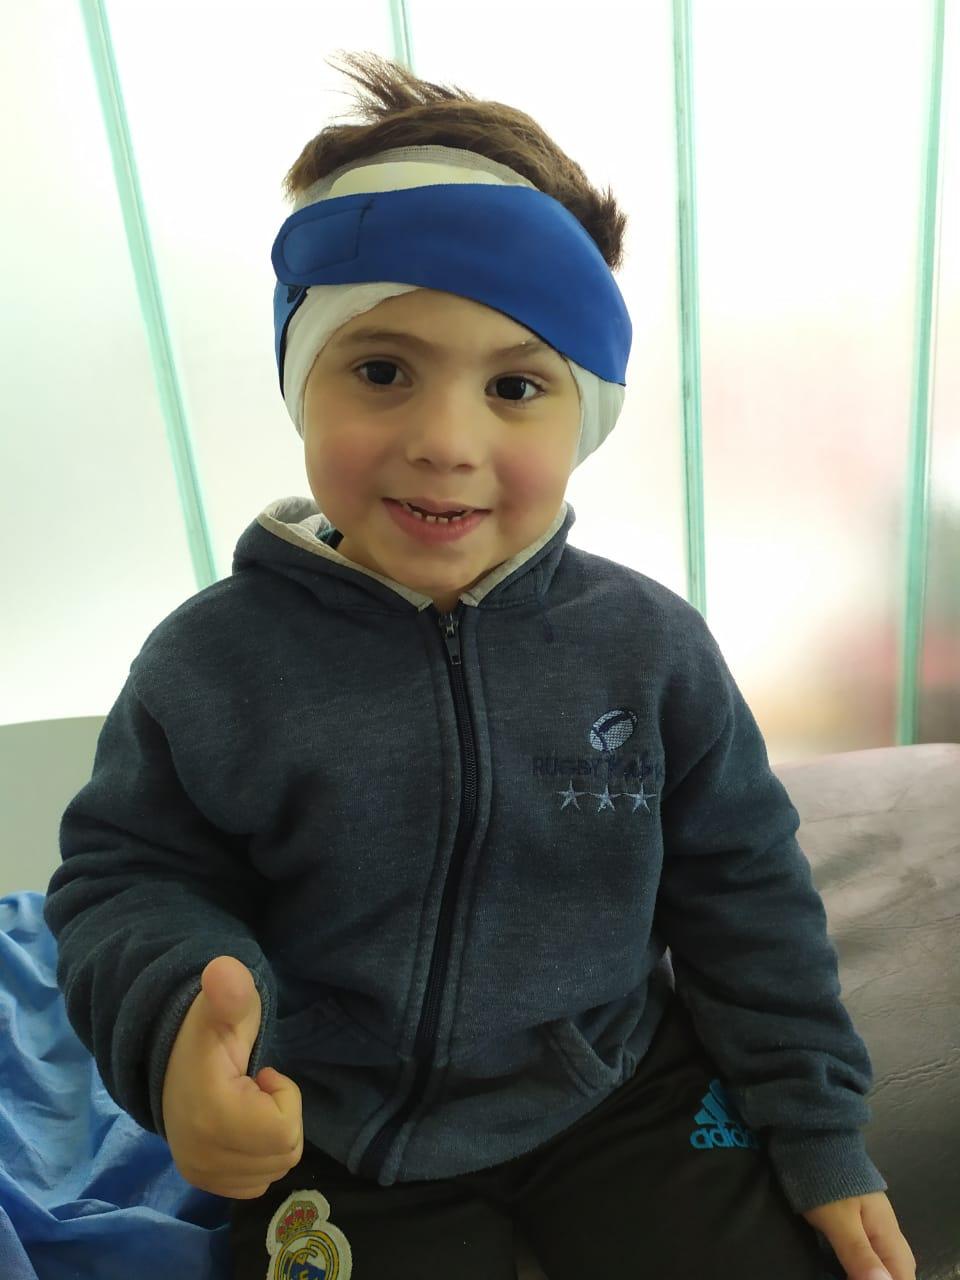 Malvinas Argentinas: Un niño de cuatro años que nació con hipoacusia logrará escuchar Whatsa32